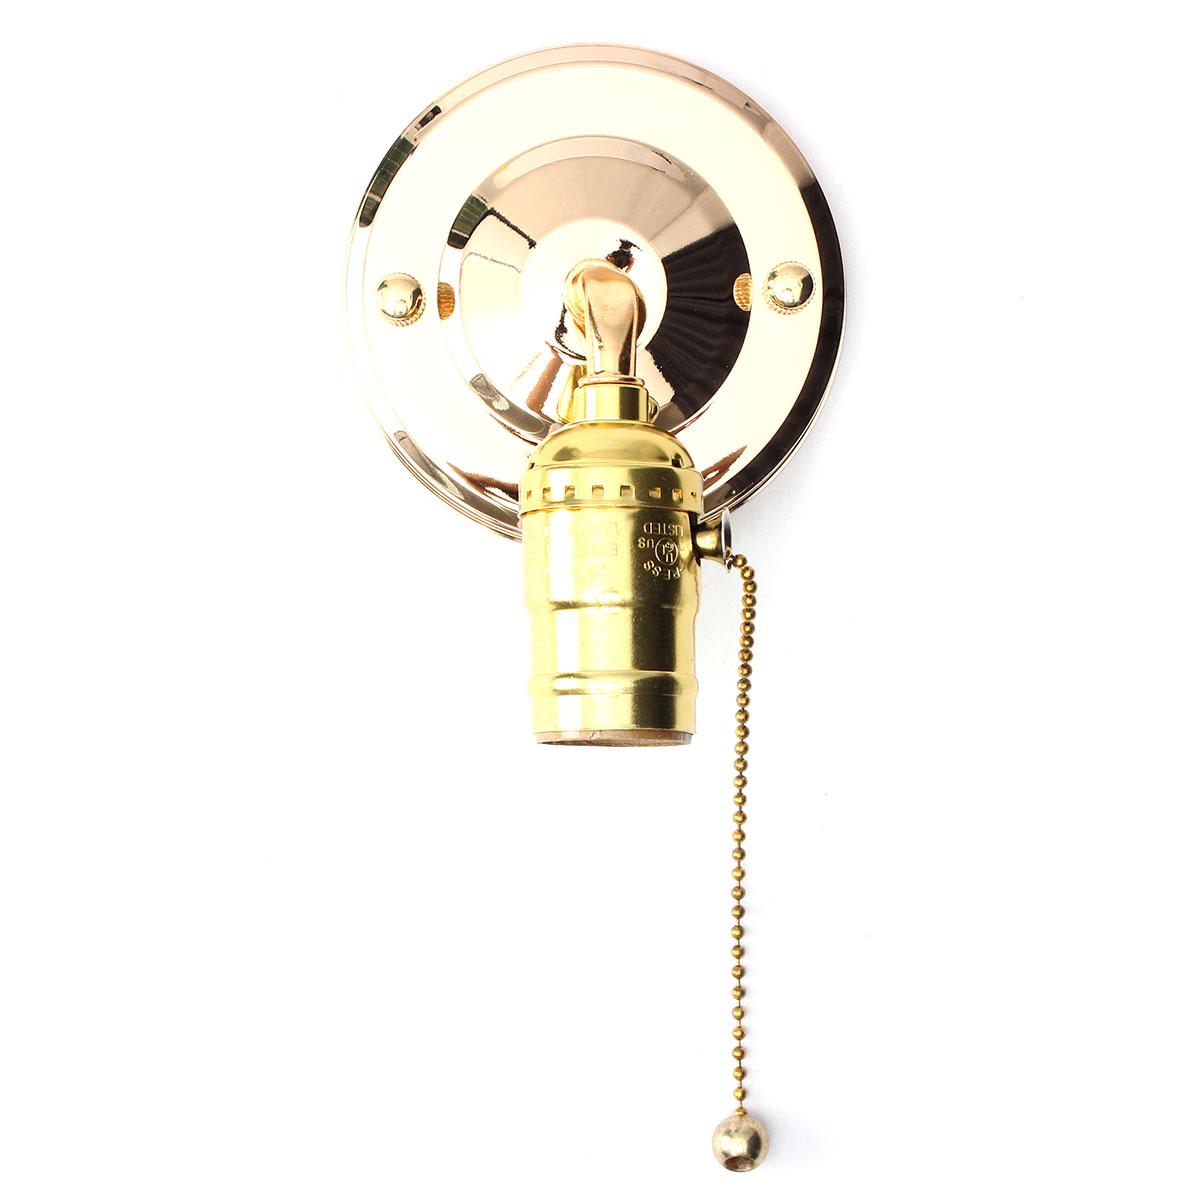 E27 Antique Vintage Wall Light Chain Design Sconce Lamp Bulb Socket Holder Fixture Alex NLD